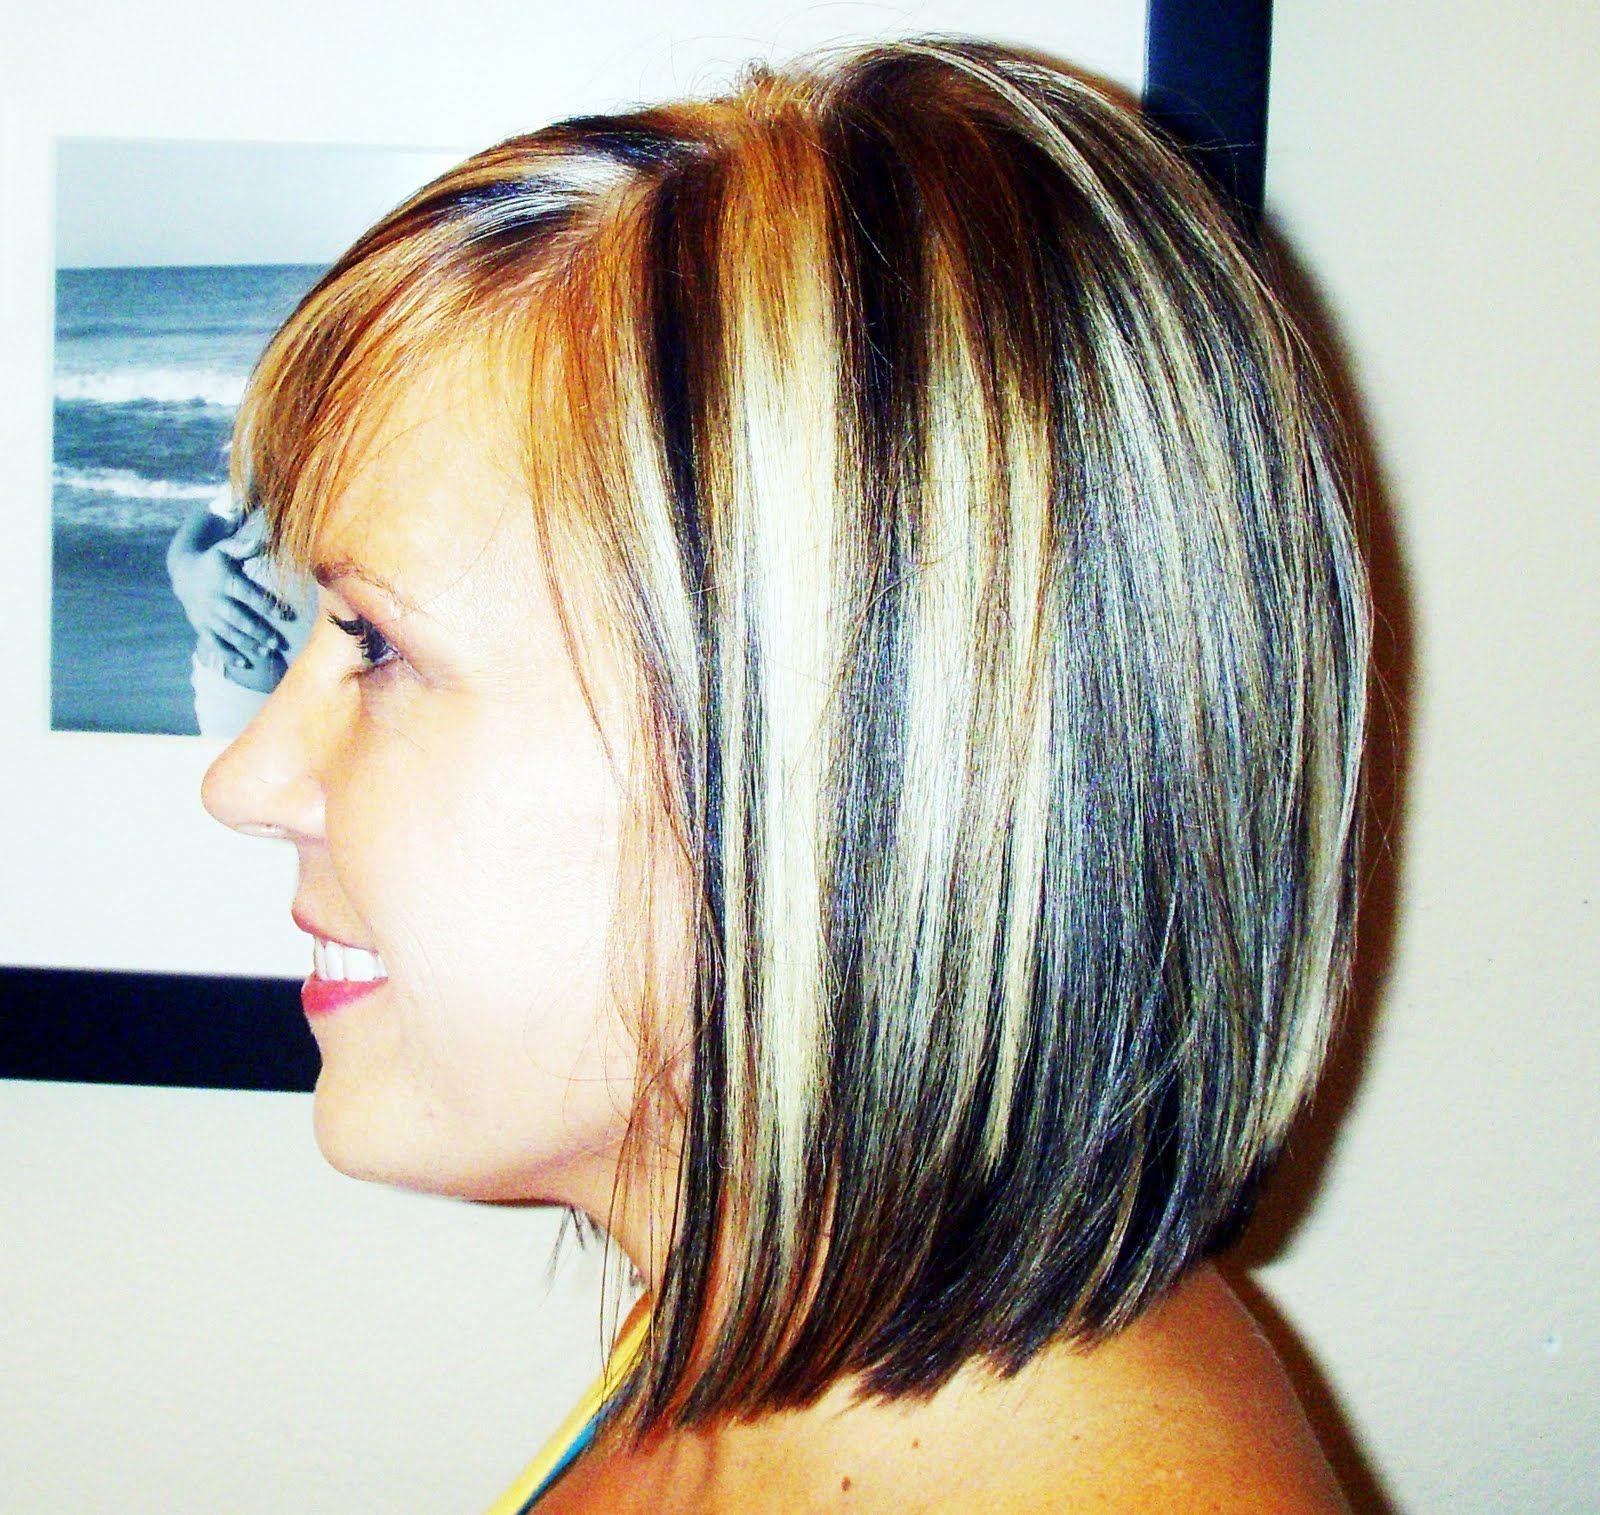 Kelly Clarkson Bob Haircut | Kelly Clarkson Hair Color | Hairstyles Inside Kelly Clarkson Hairstyles Short (View 10 of 25)